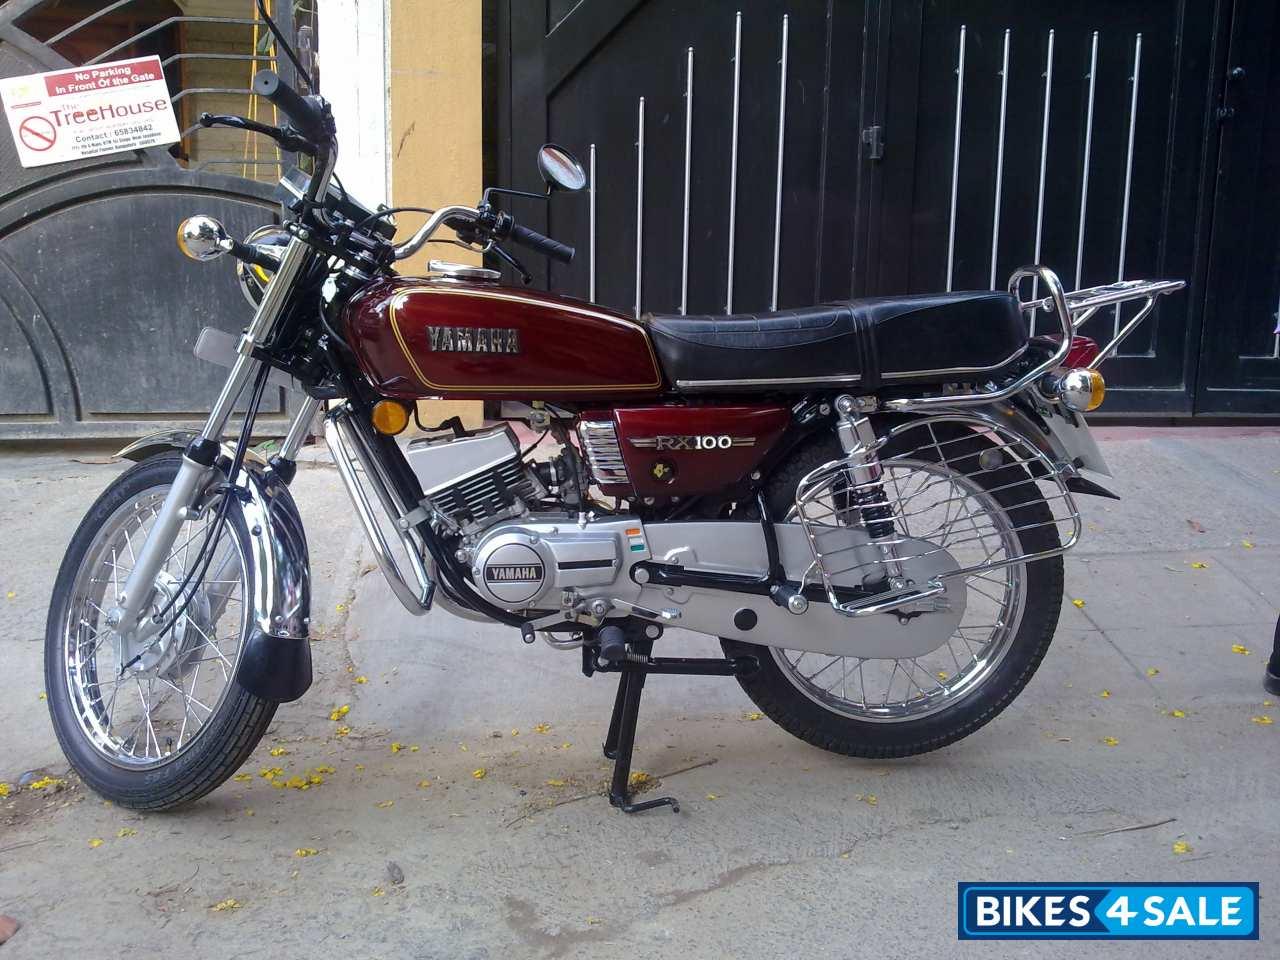 rx 100 bike price in bangalore dating